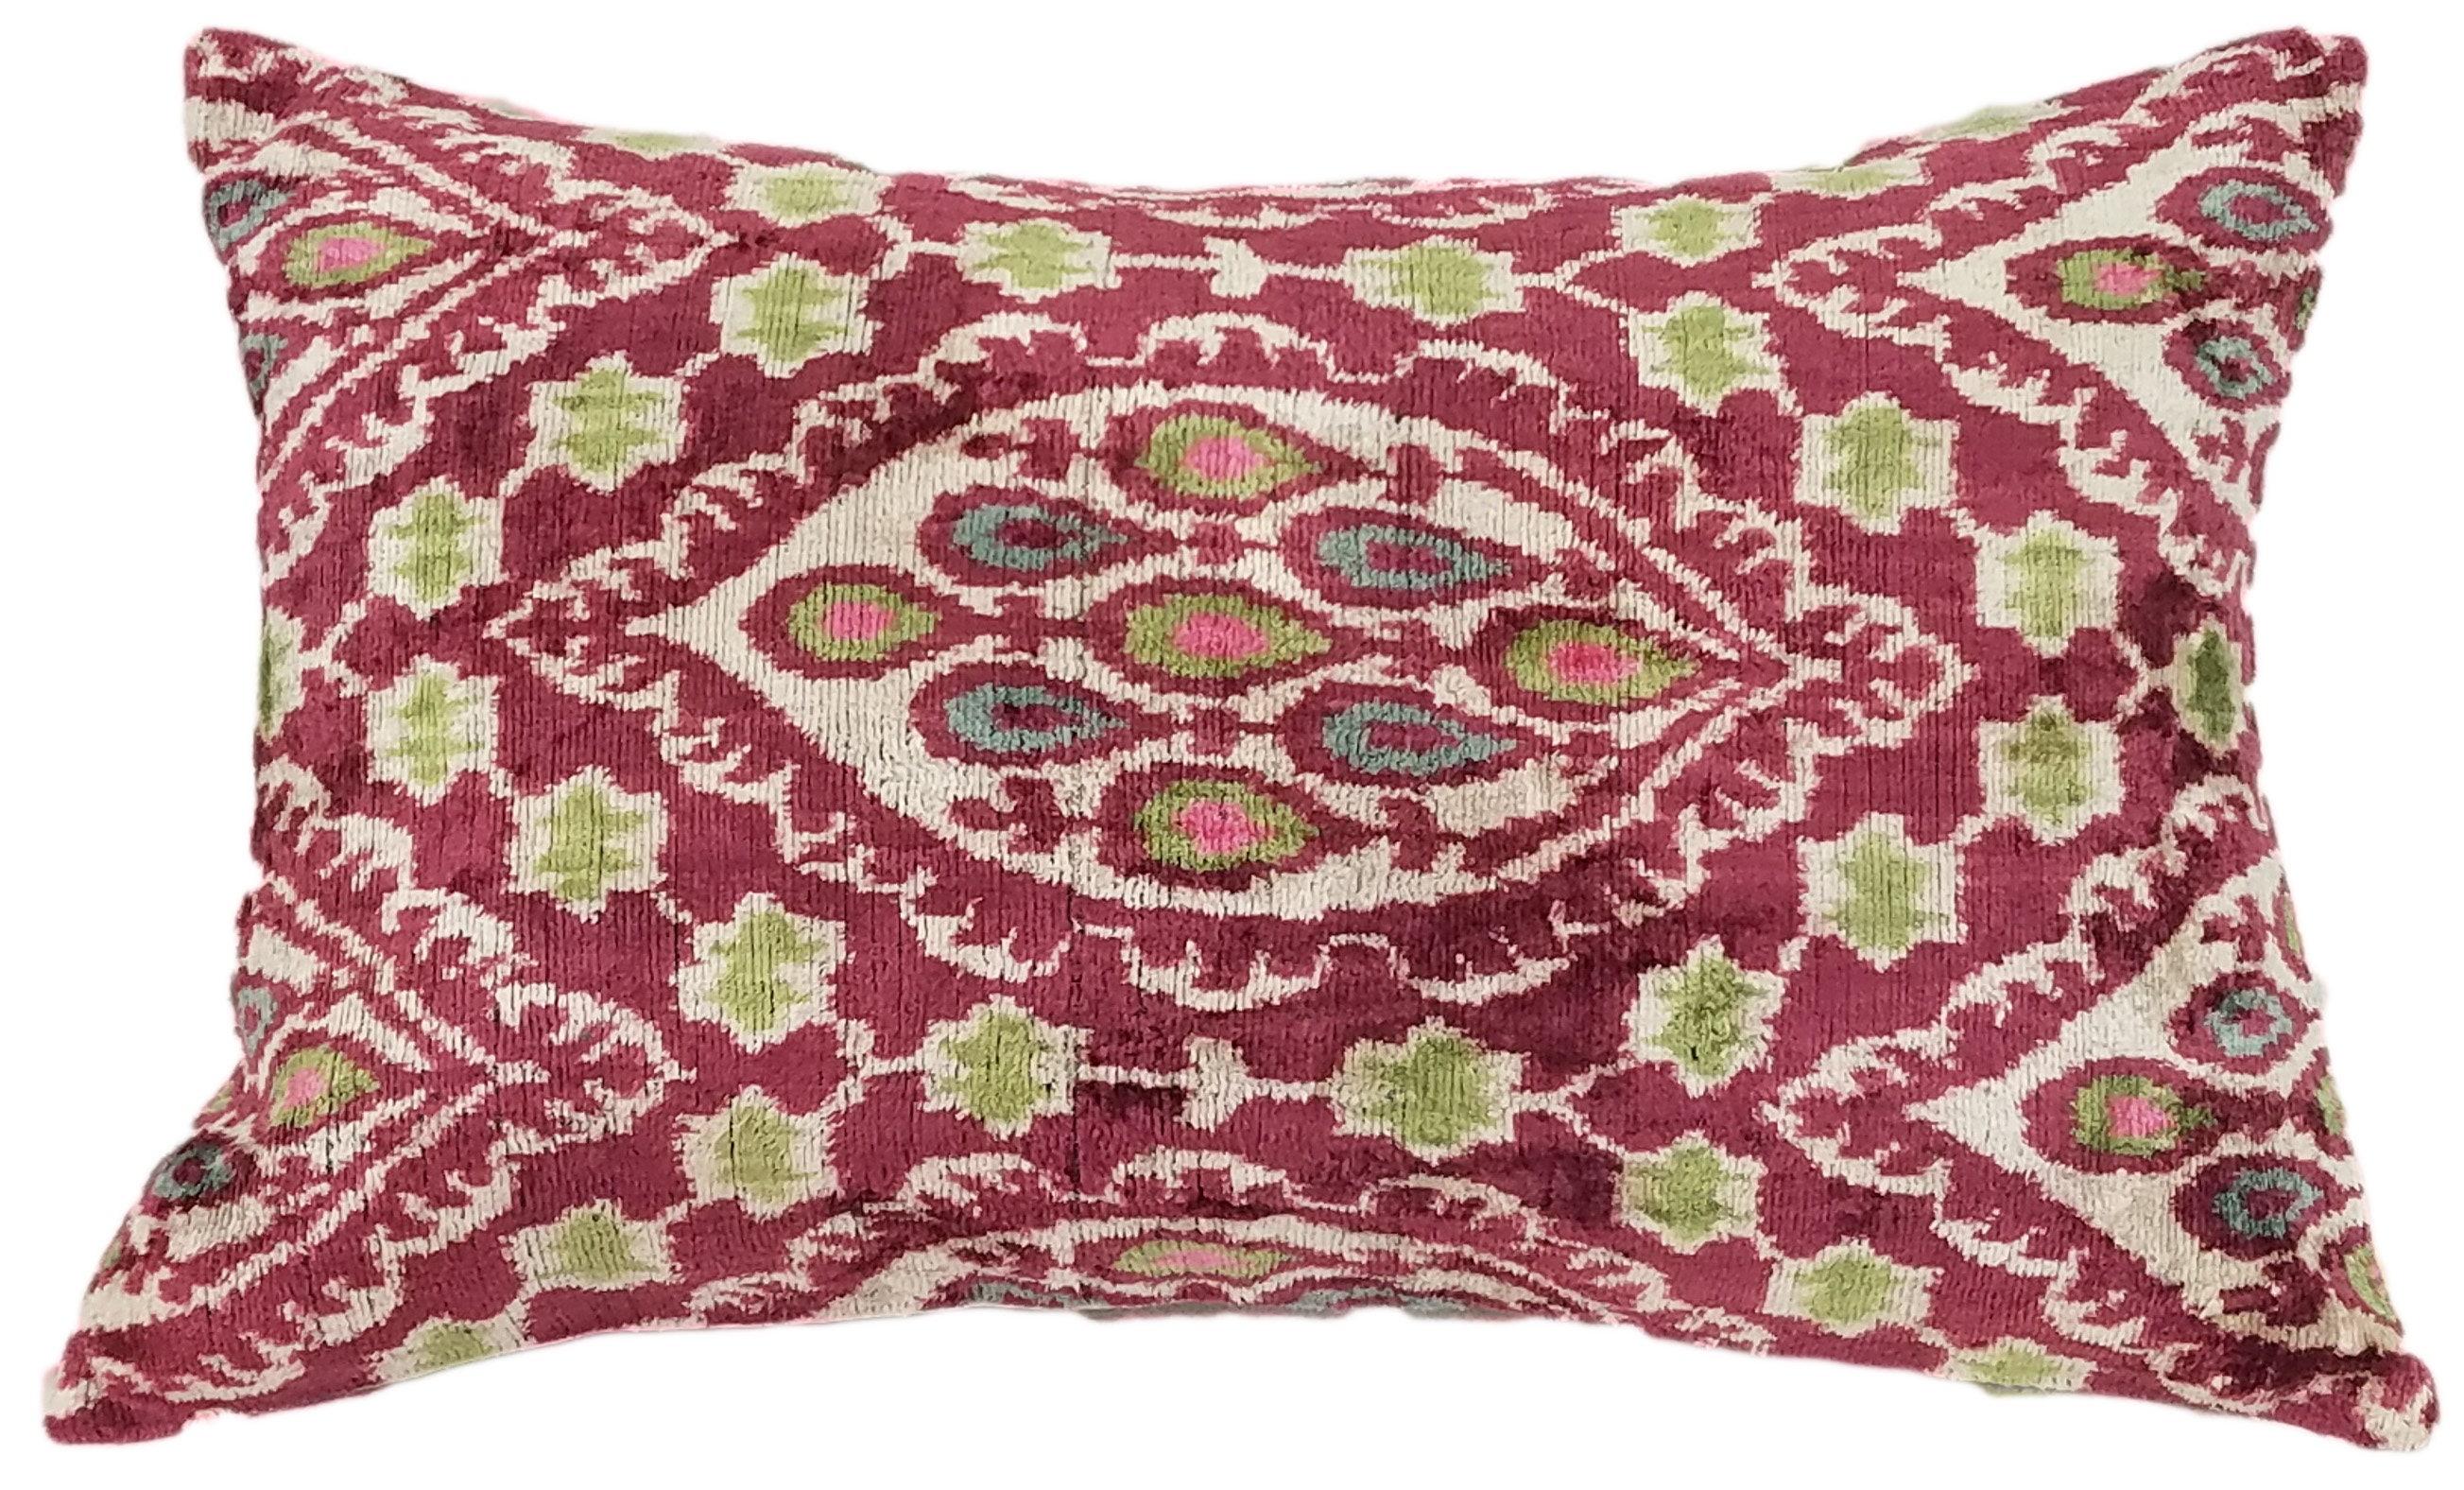 Ikat Lumbar Pillow Velvet Pillow Cover Living Room Pillow